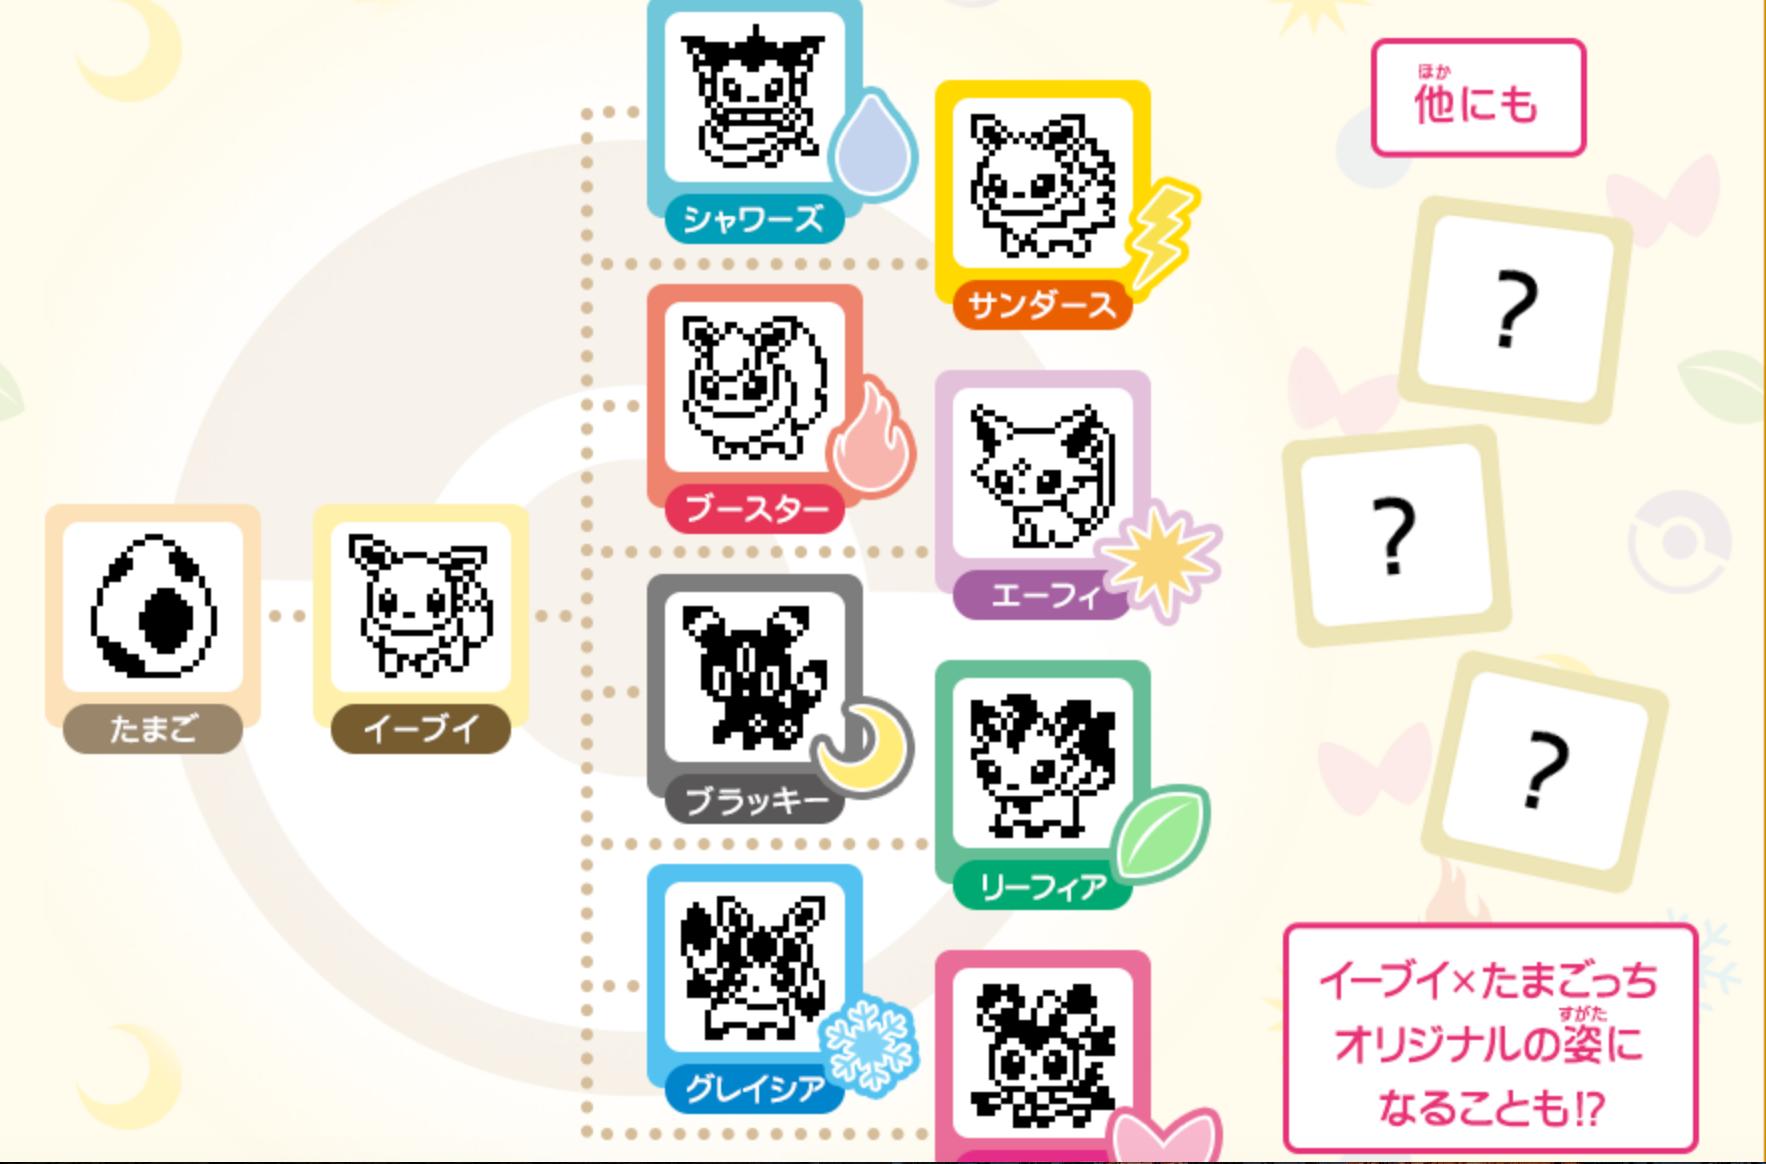 Tamagotchi pokemon 3